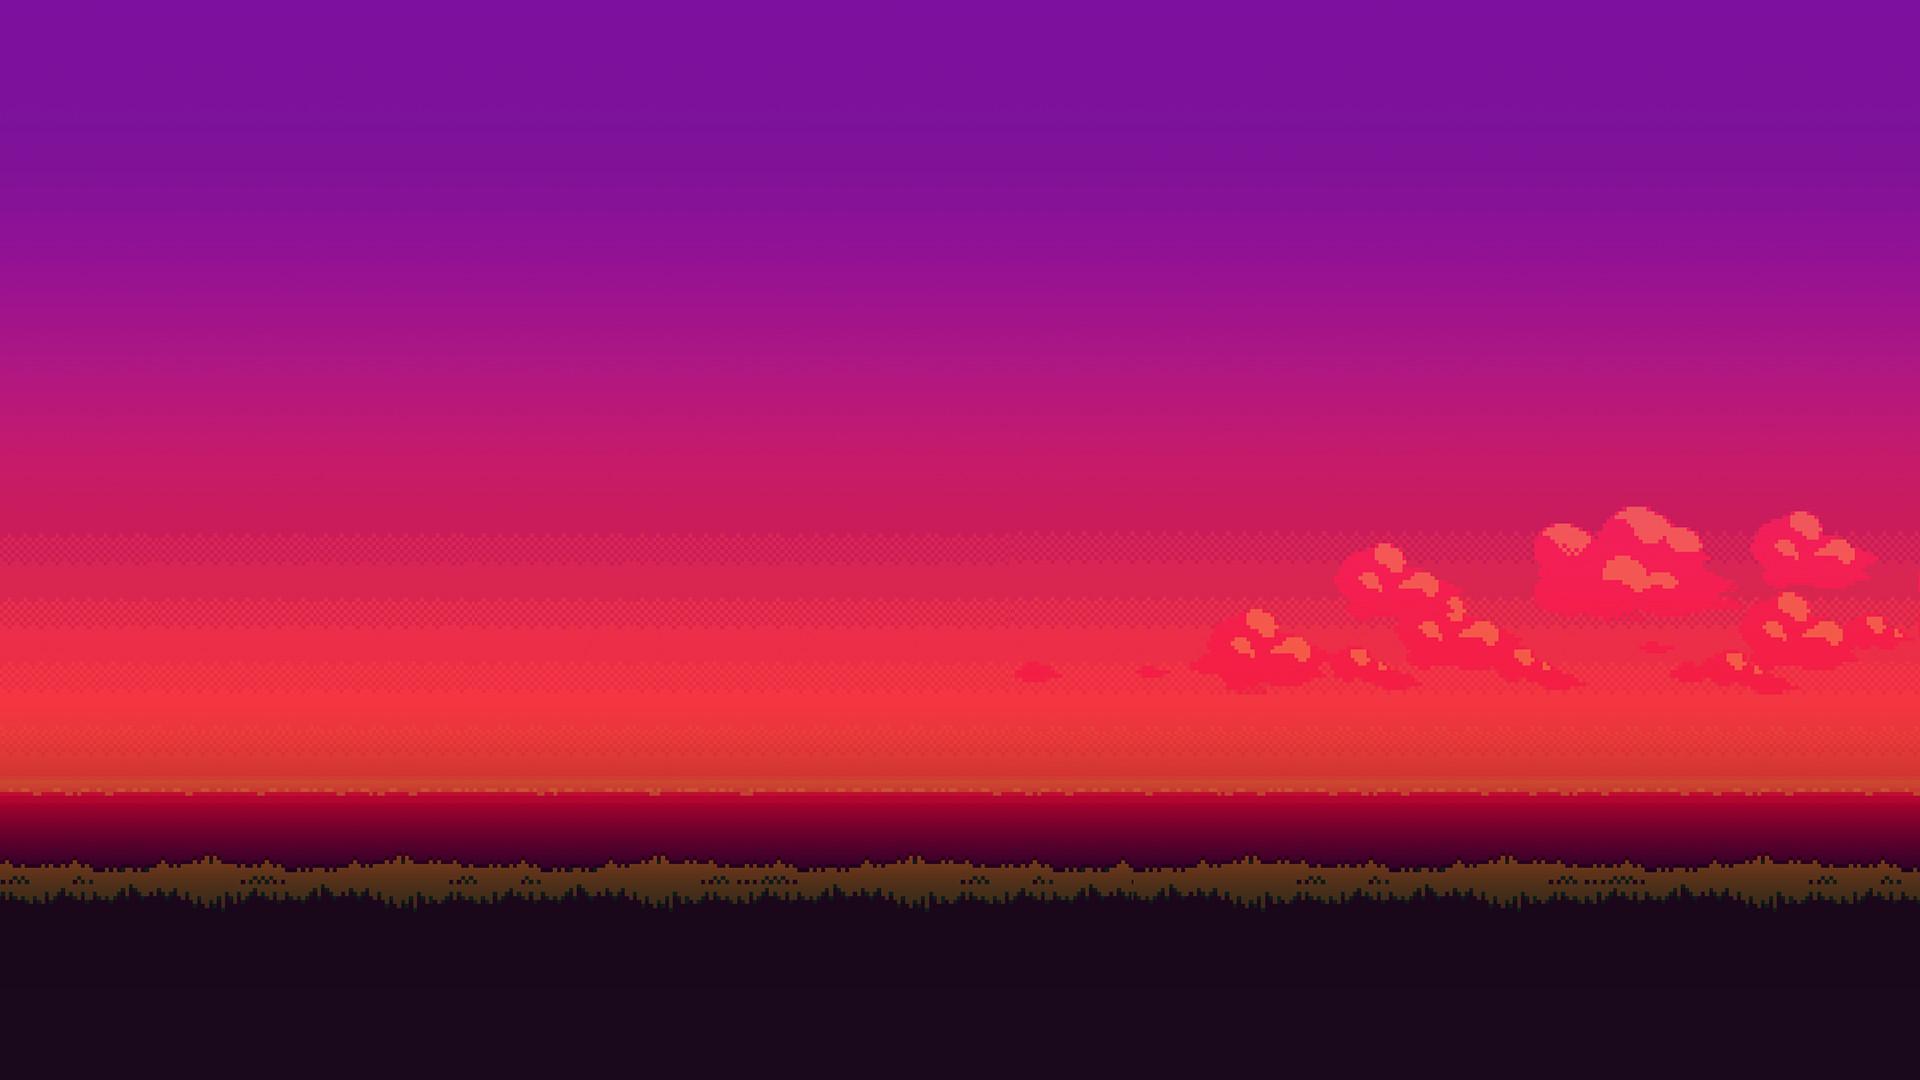 8 Bit Wallpaper HD (79+ images)